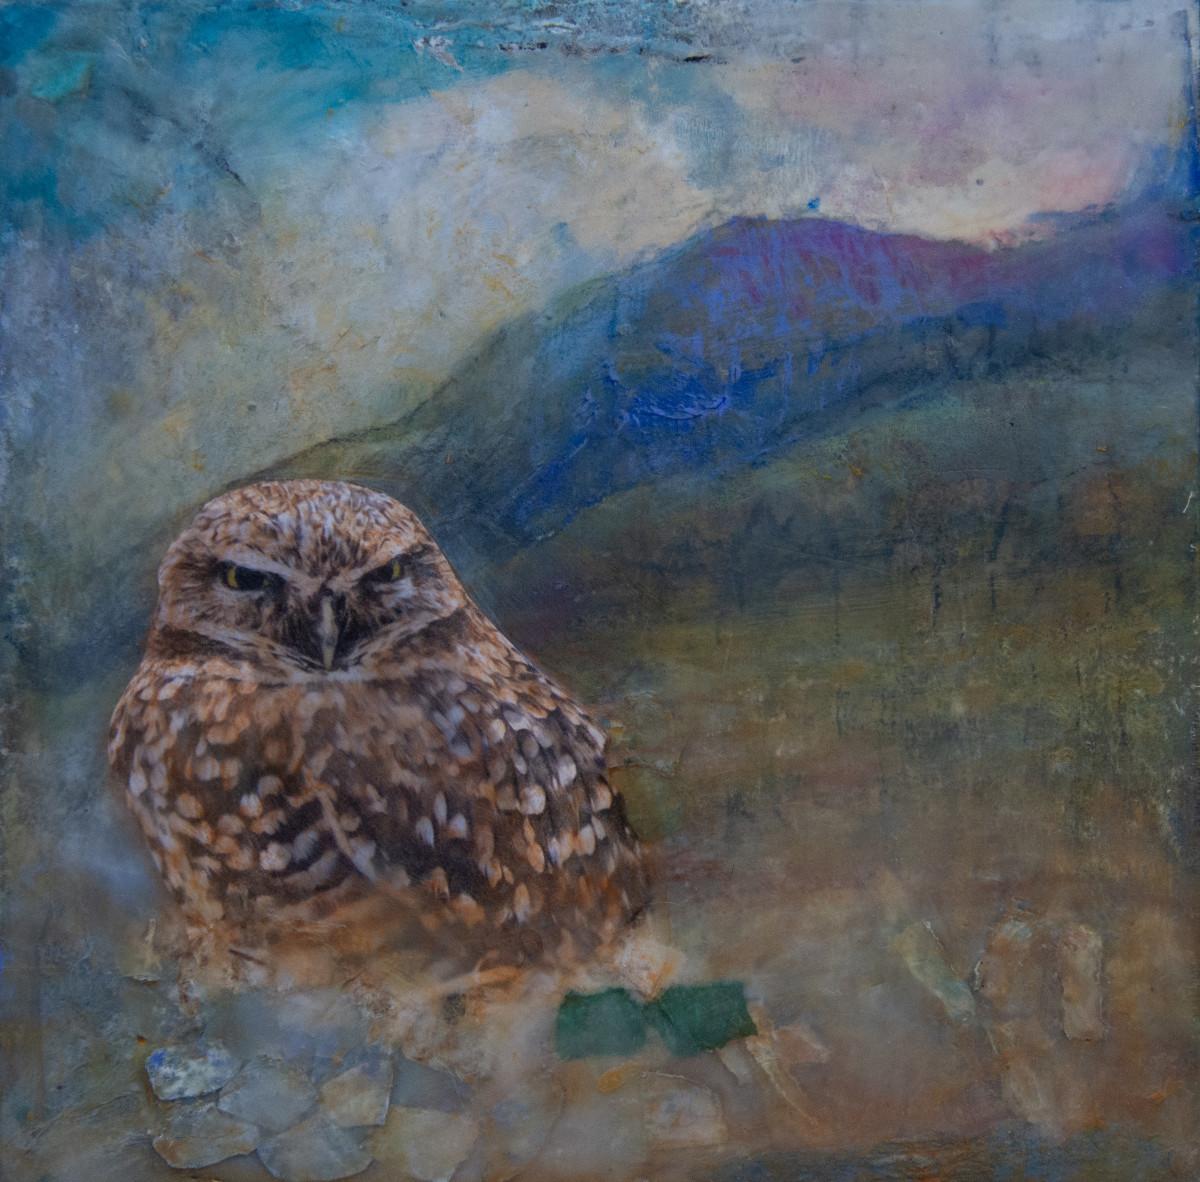 Burrowing Owl by Alise Sheehan Art